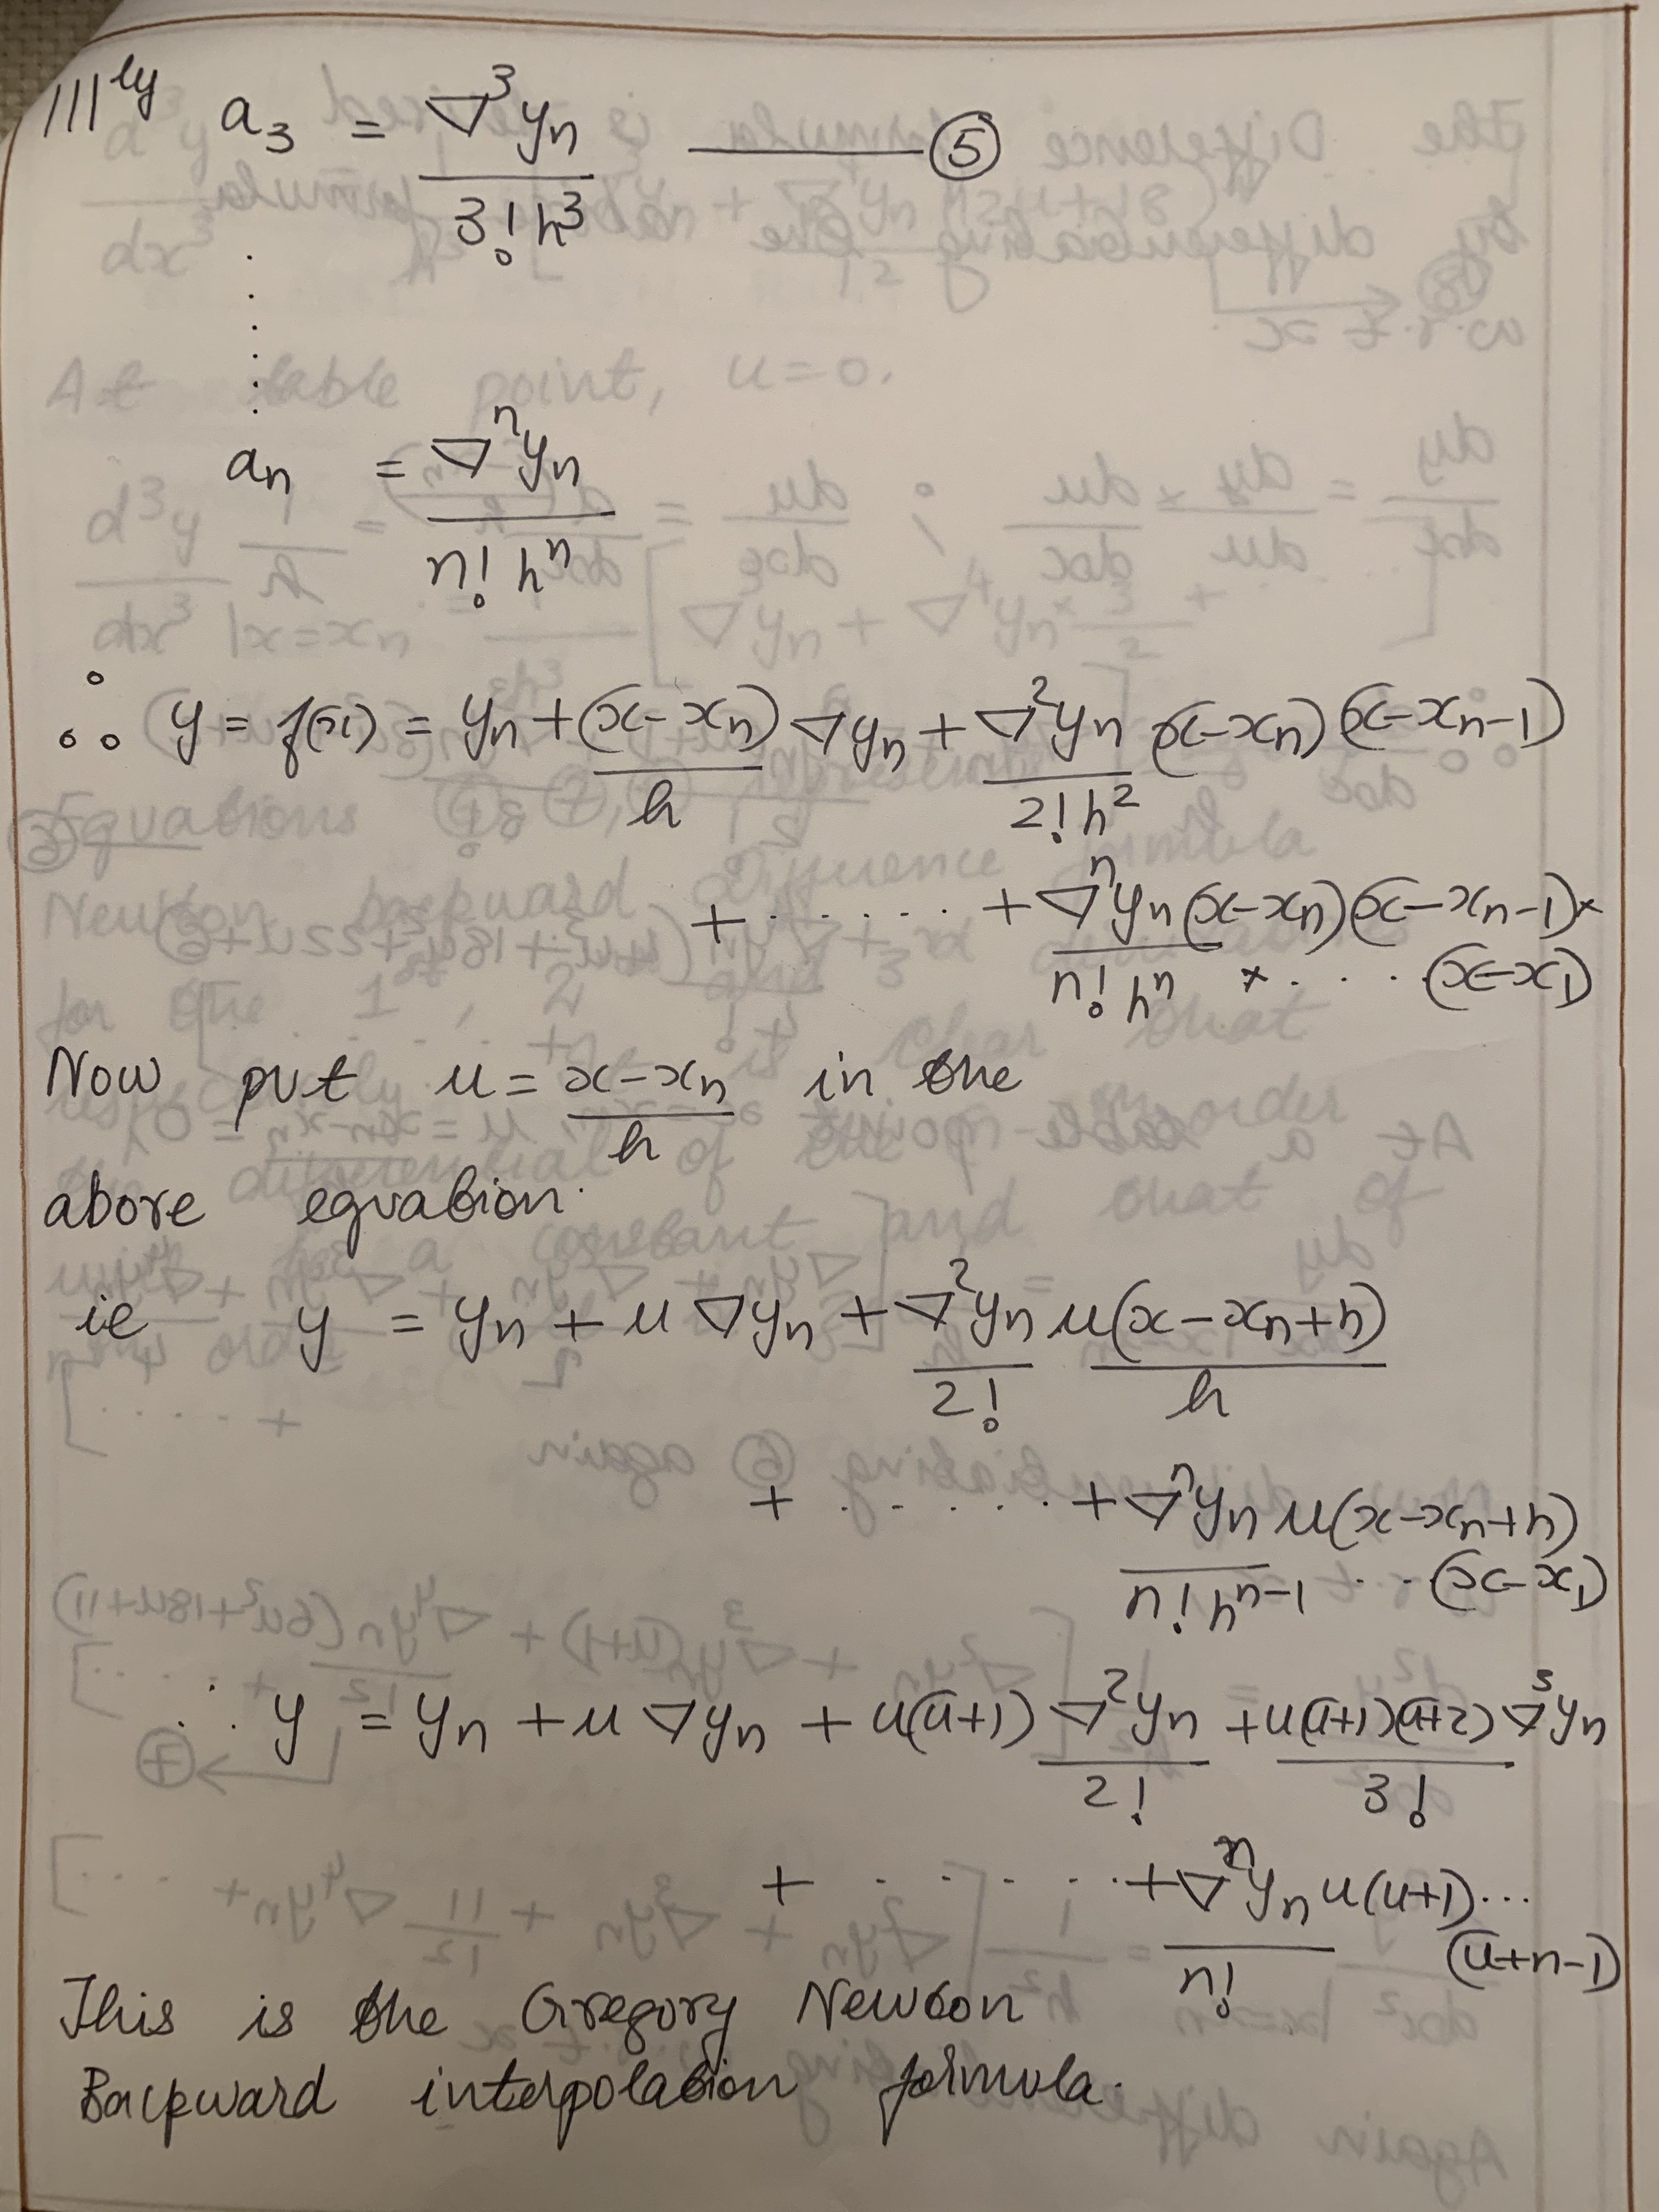 Gregory Newton Backward Interpolation Method